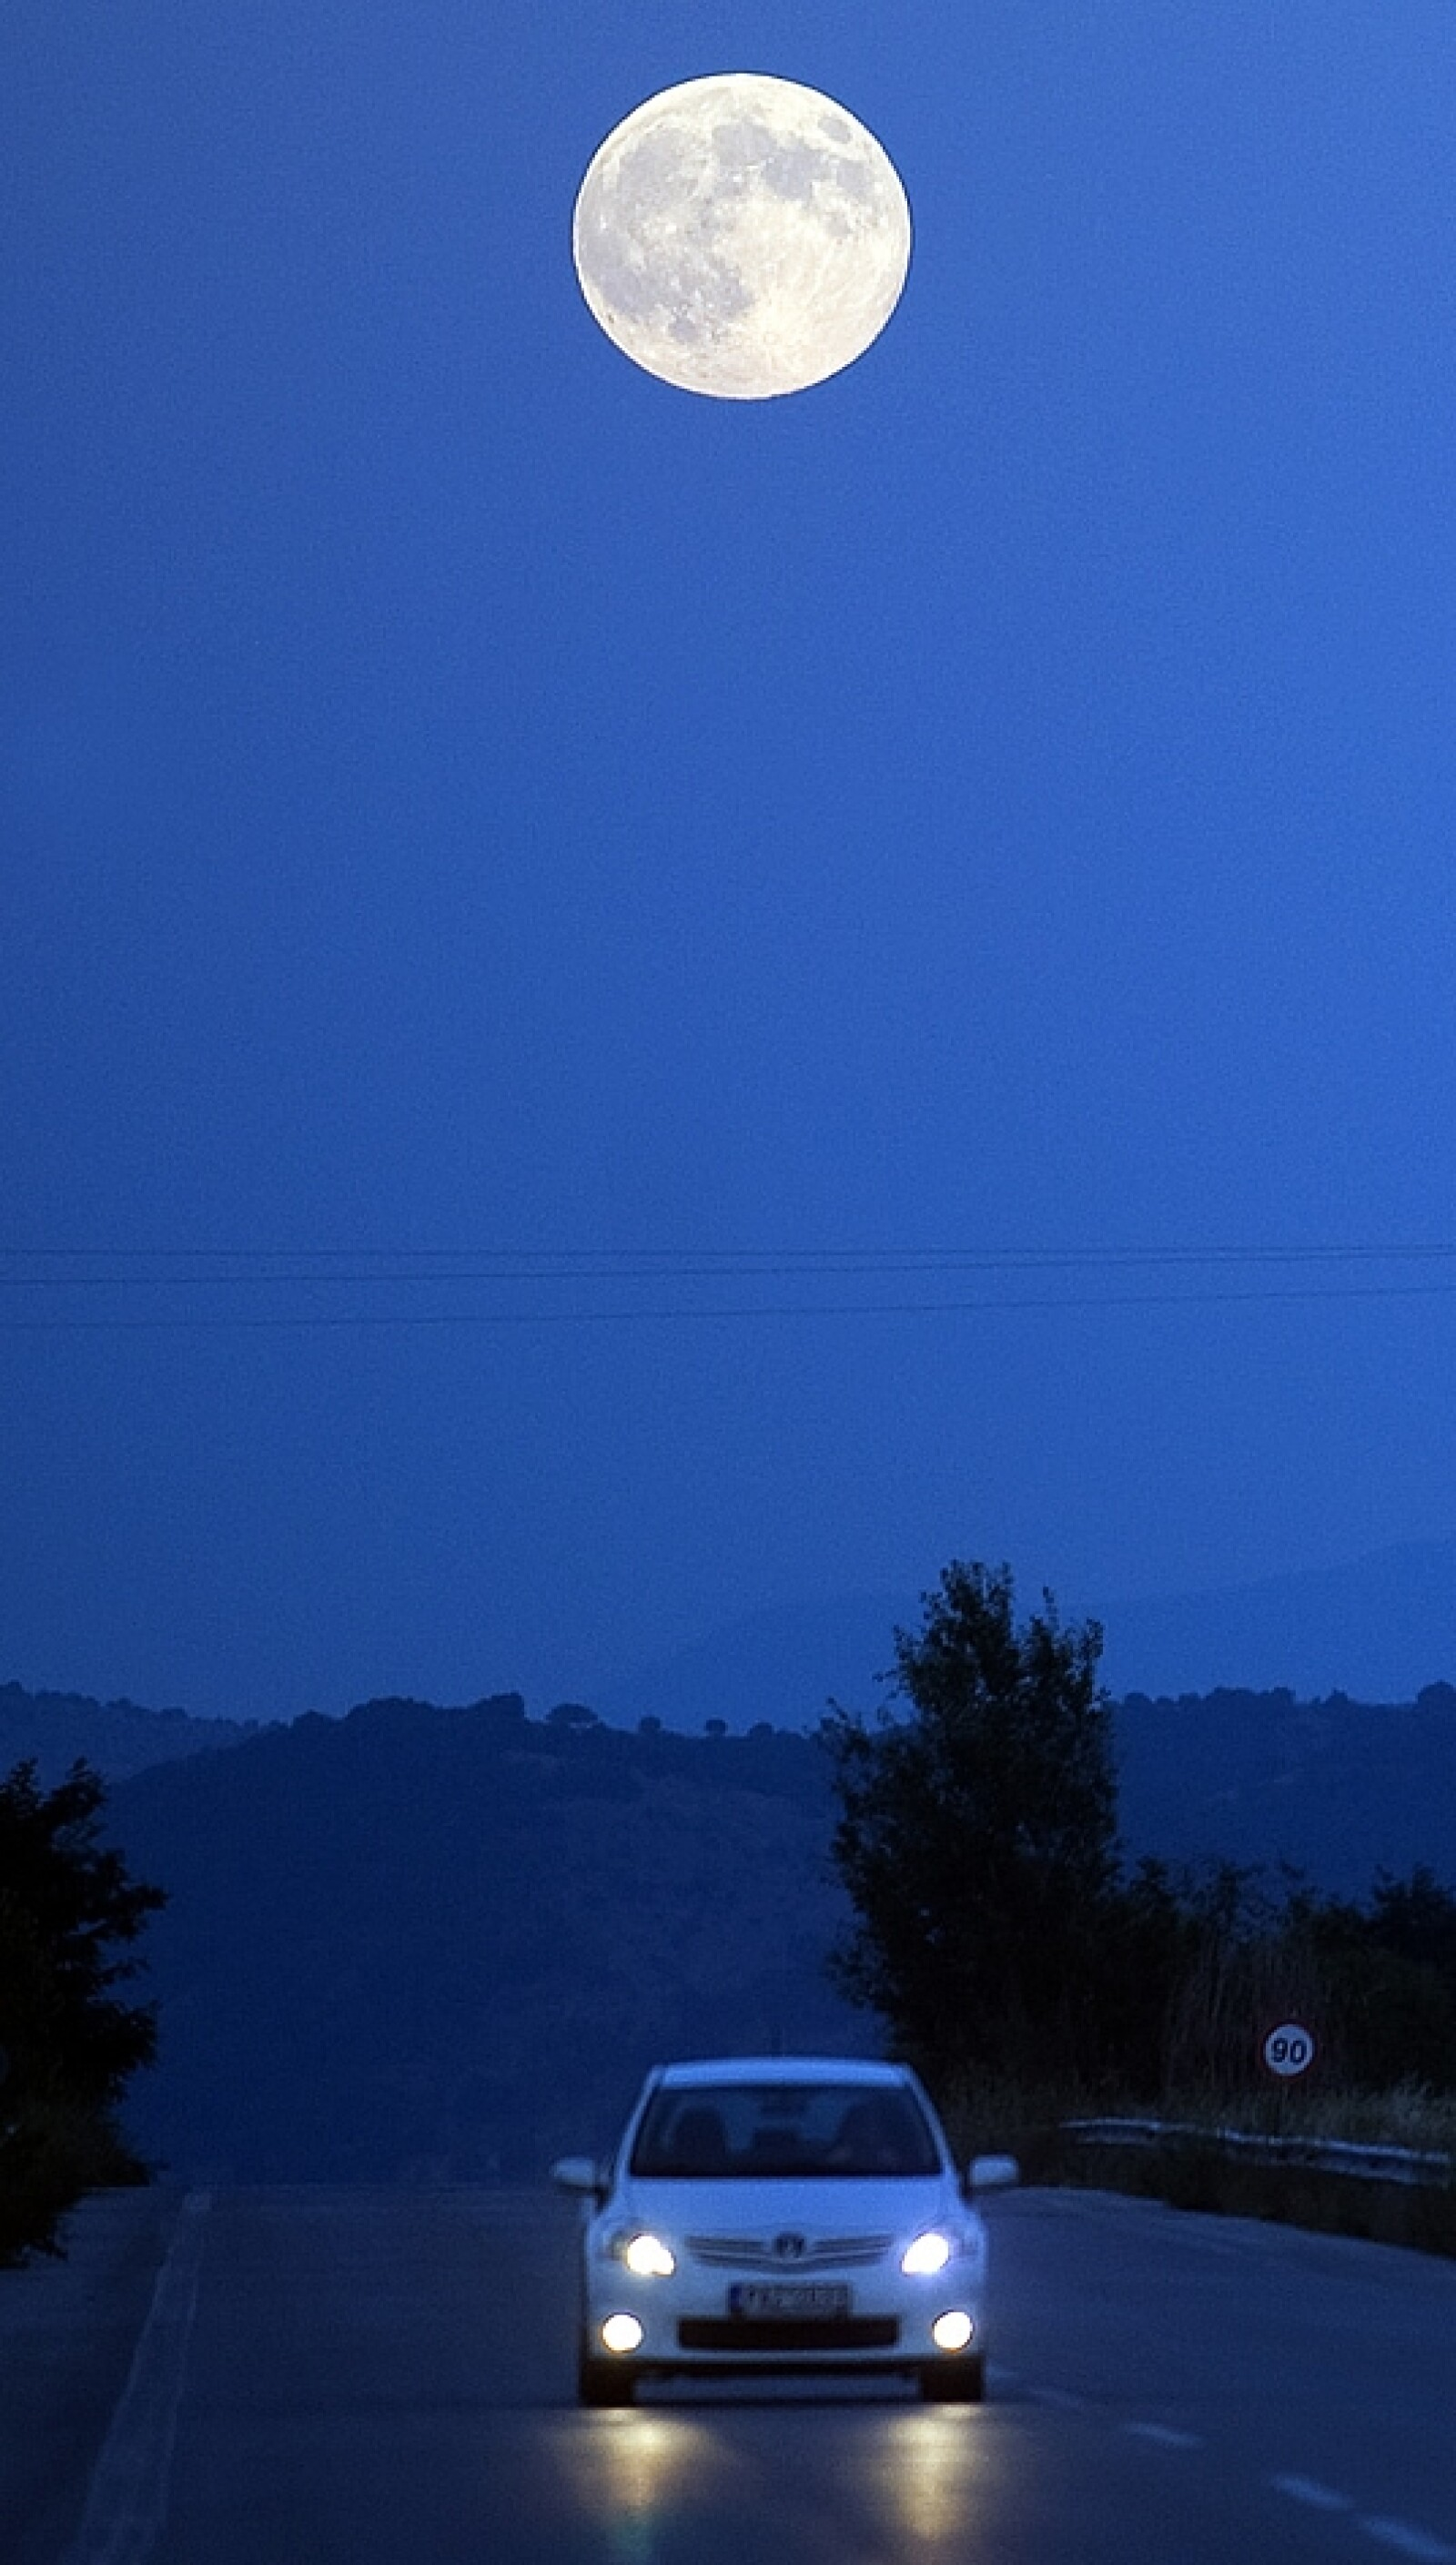 Macedonia camino super luna